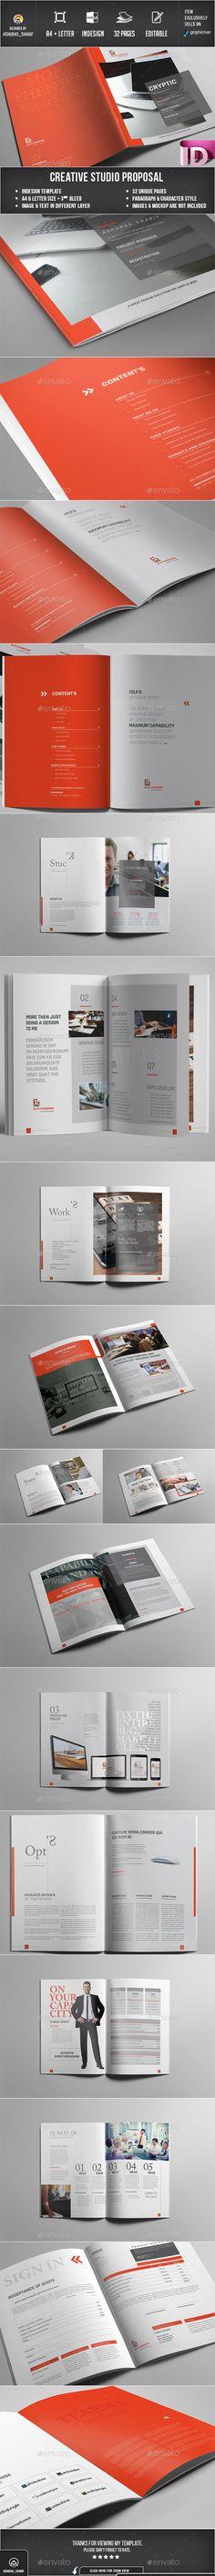 Proposal 32 Pages Template InDesign INDD #design Download: http://graphicriver.net/item/proposal/14446541?ref=ksioks